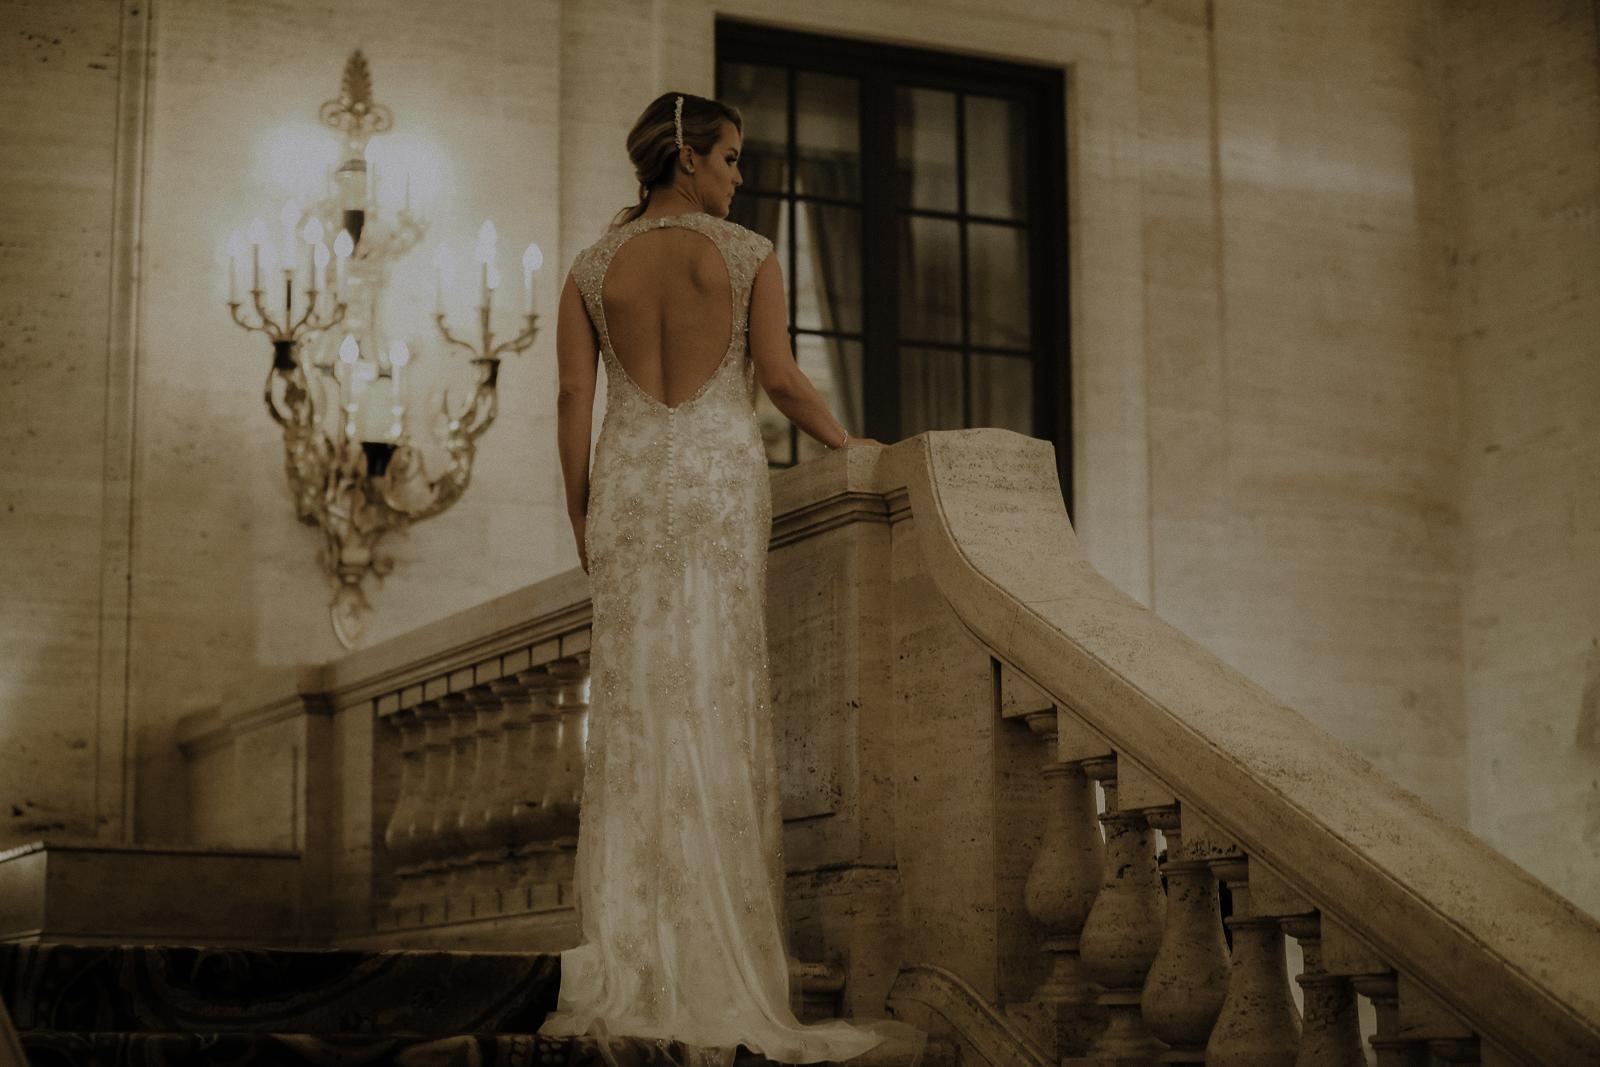 alisons-wedding-dress.jpg